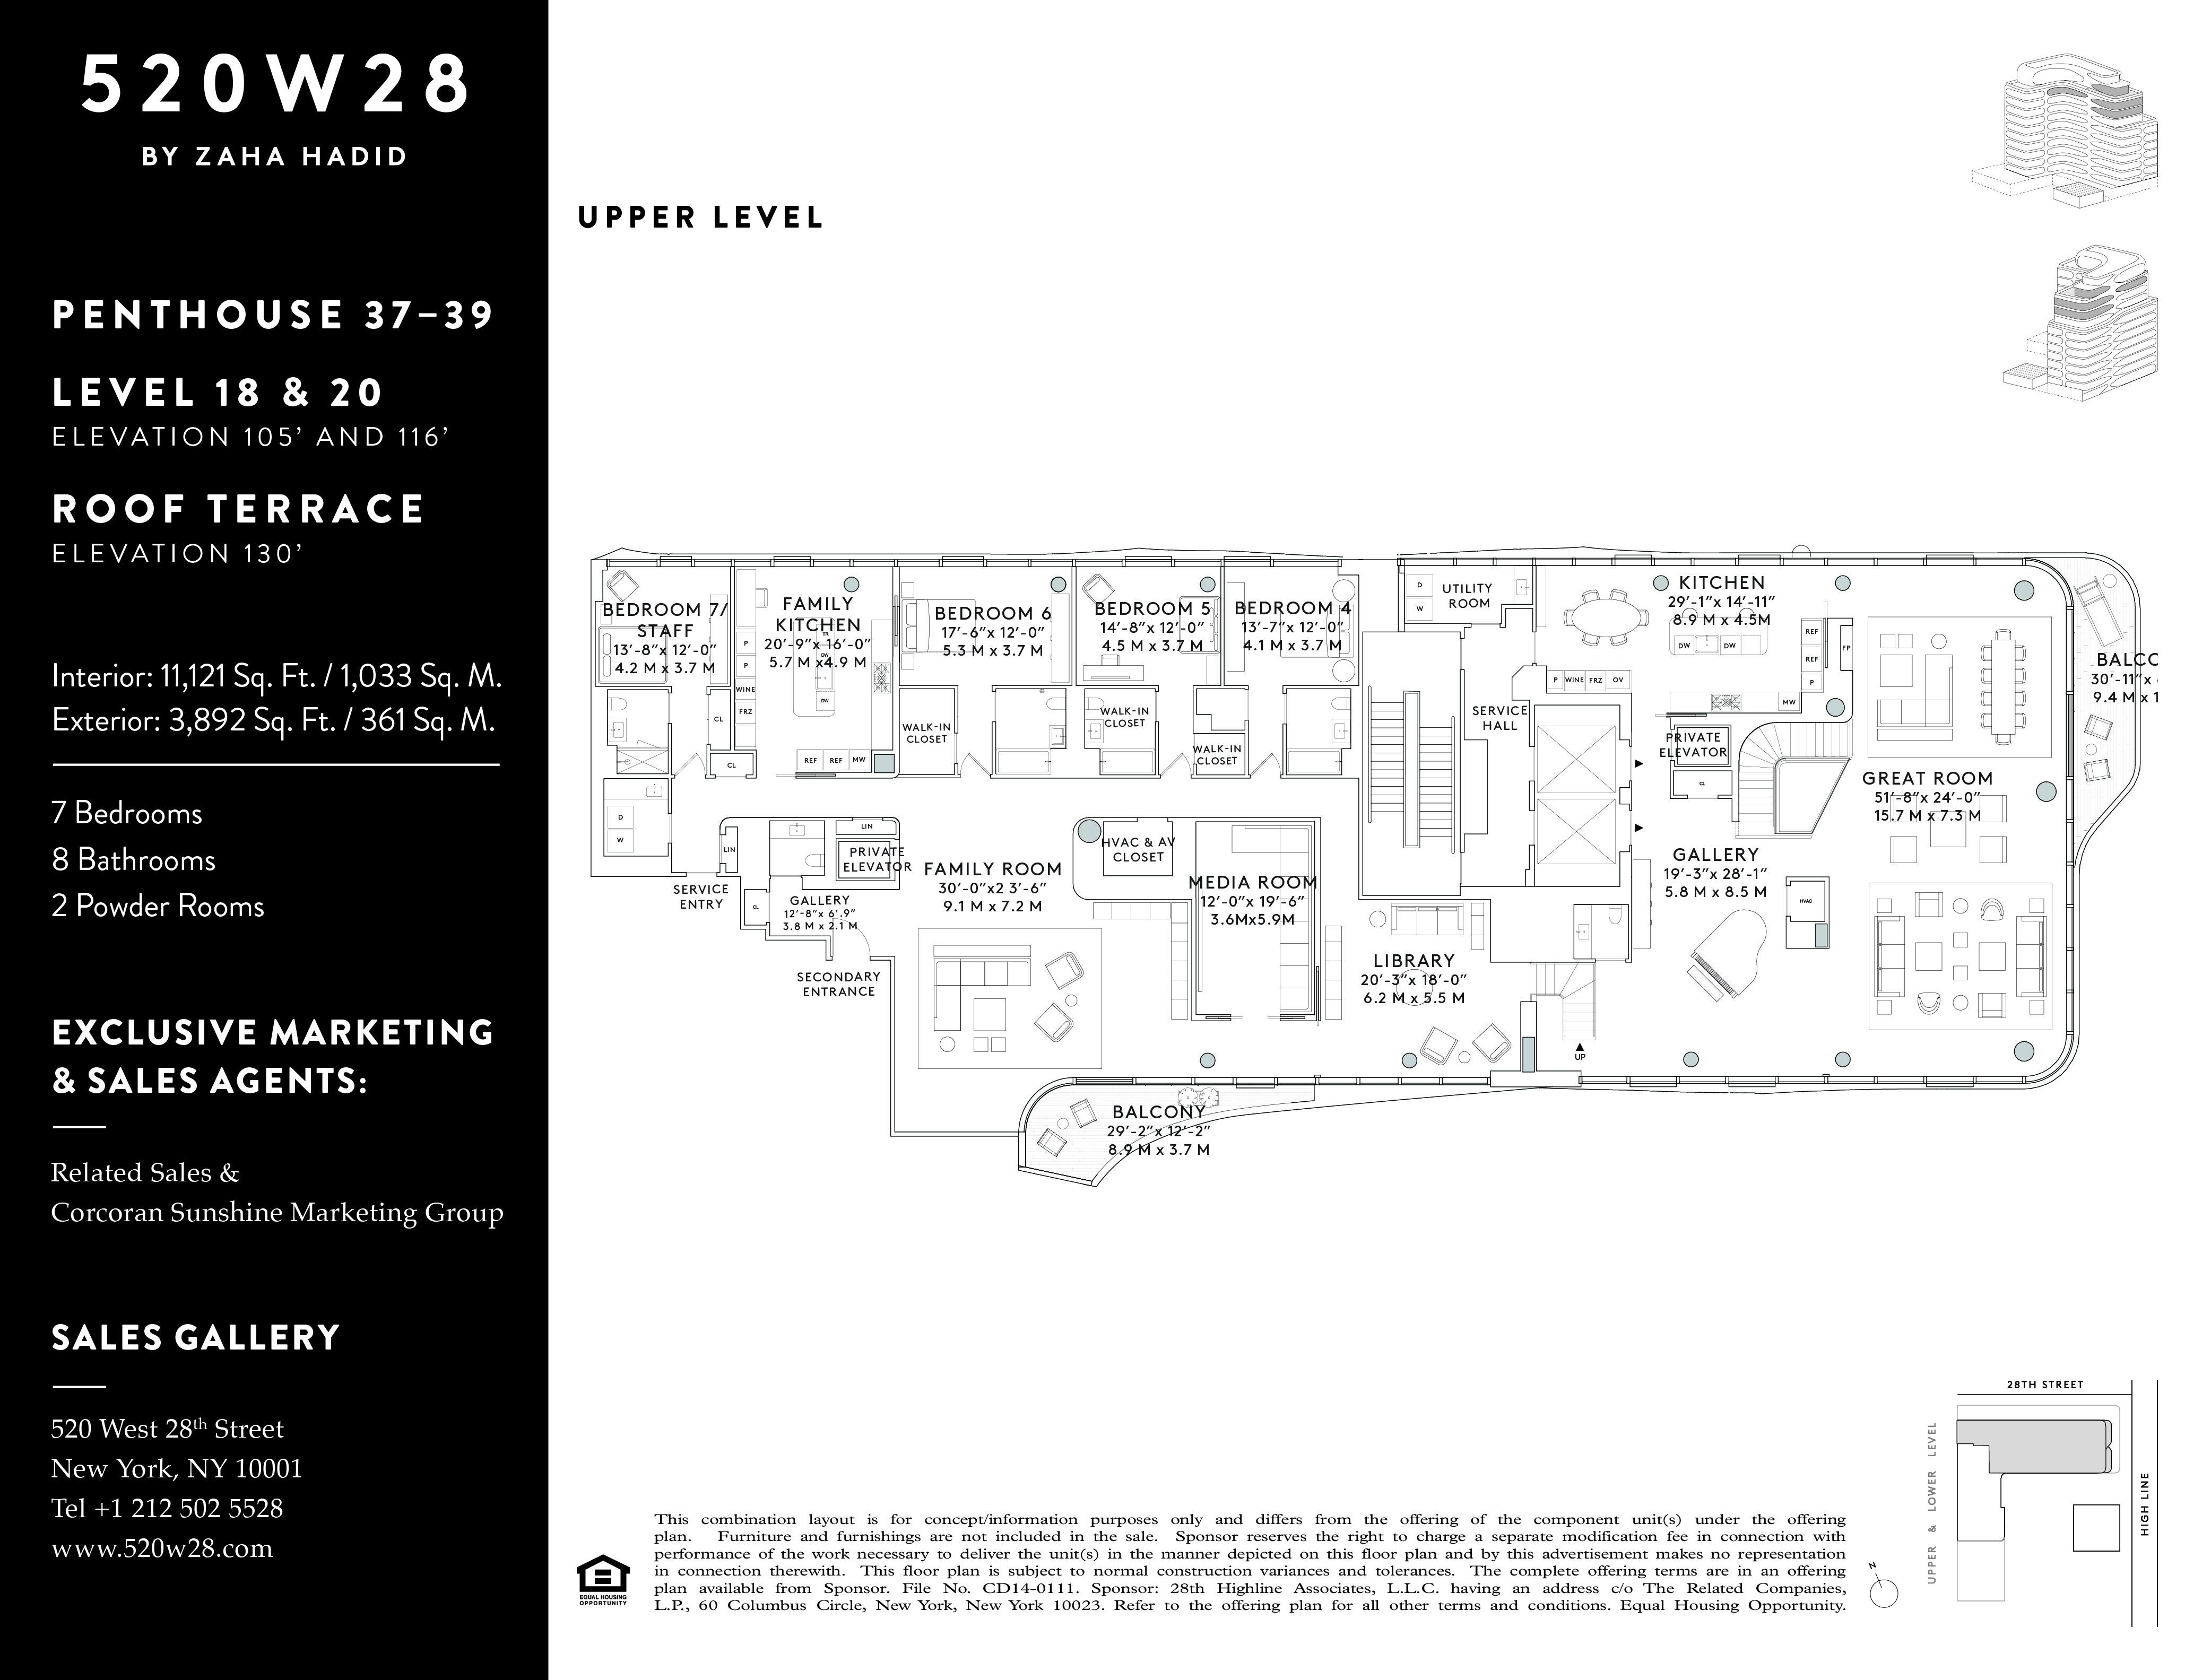 520 West 28th Street Chelsea New York NY 10001